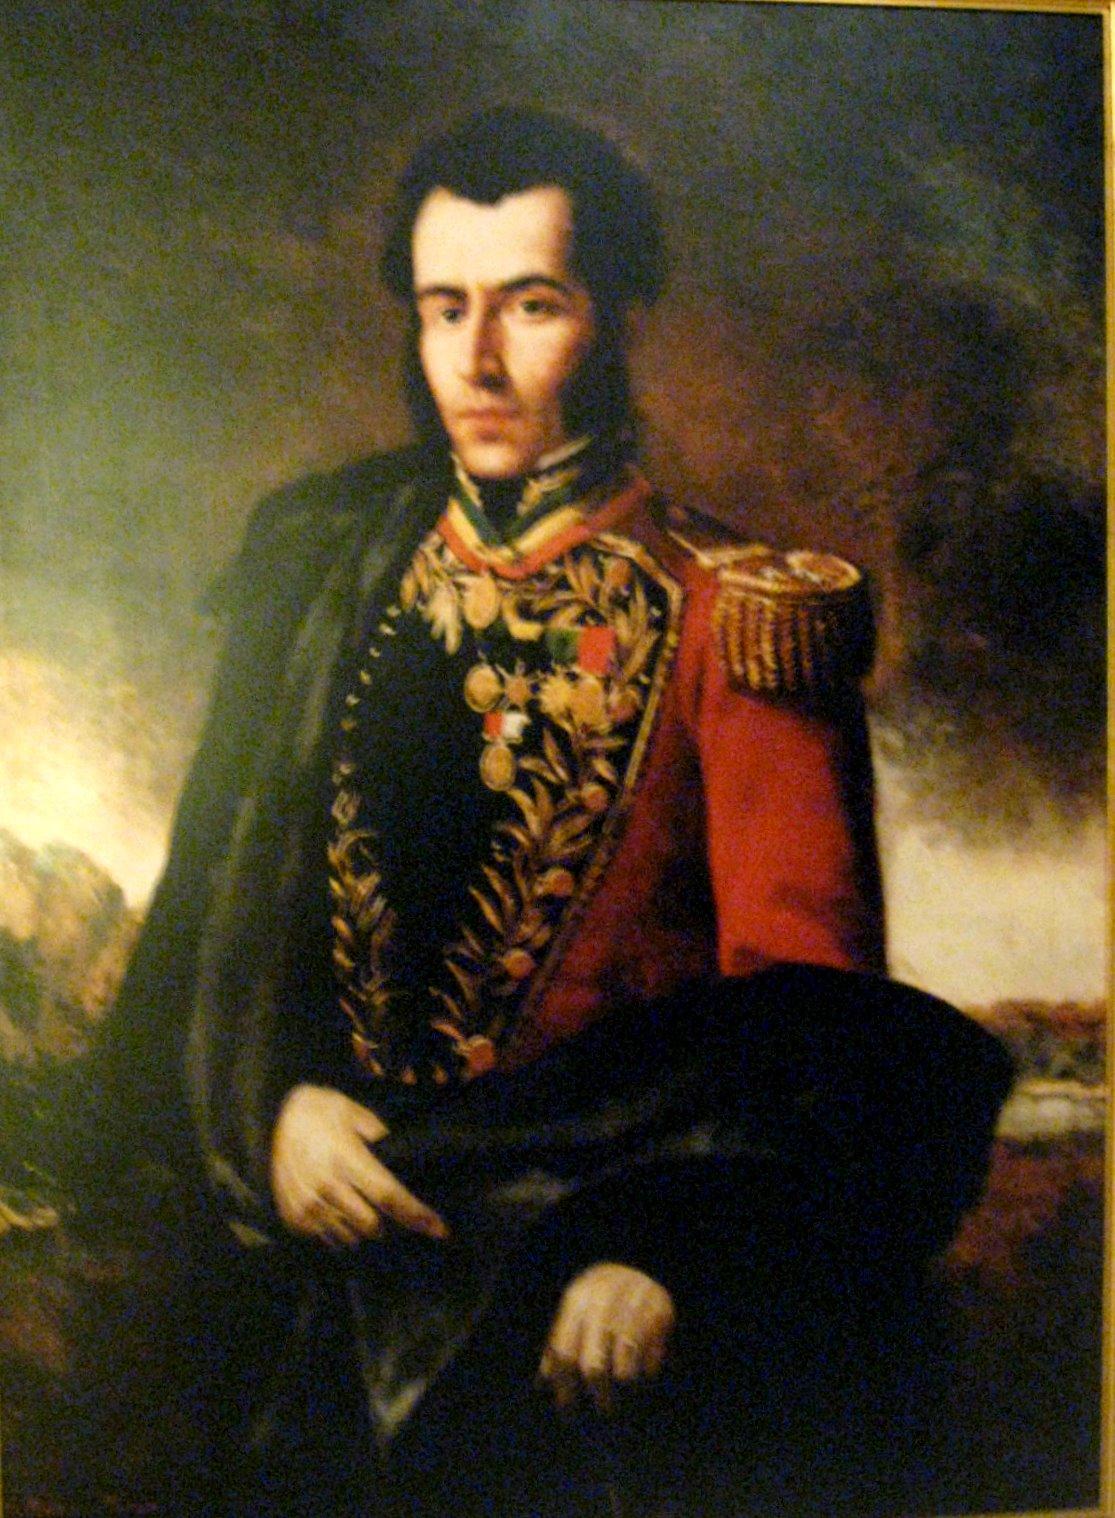 BIOGRAFIA DE ANTONIO JOSE DE SUCRE